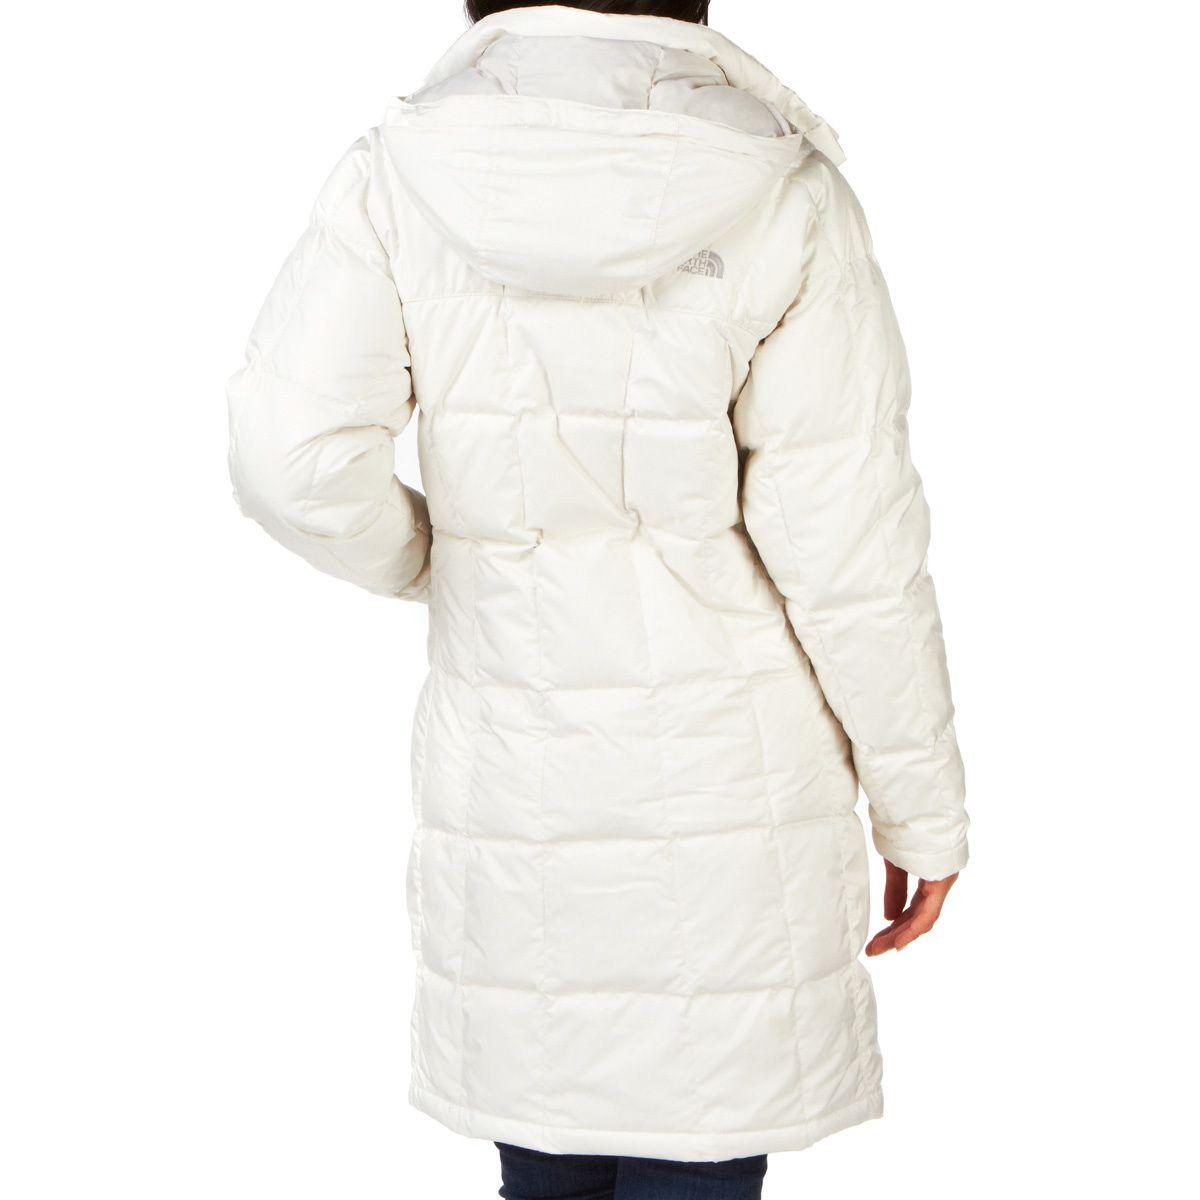 מעיל פוך נשים נורט פייס מדגם The North Face Women's Metropolis Parka Vintage White